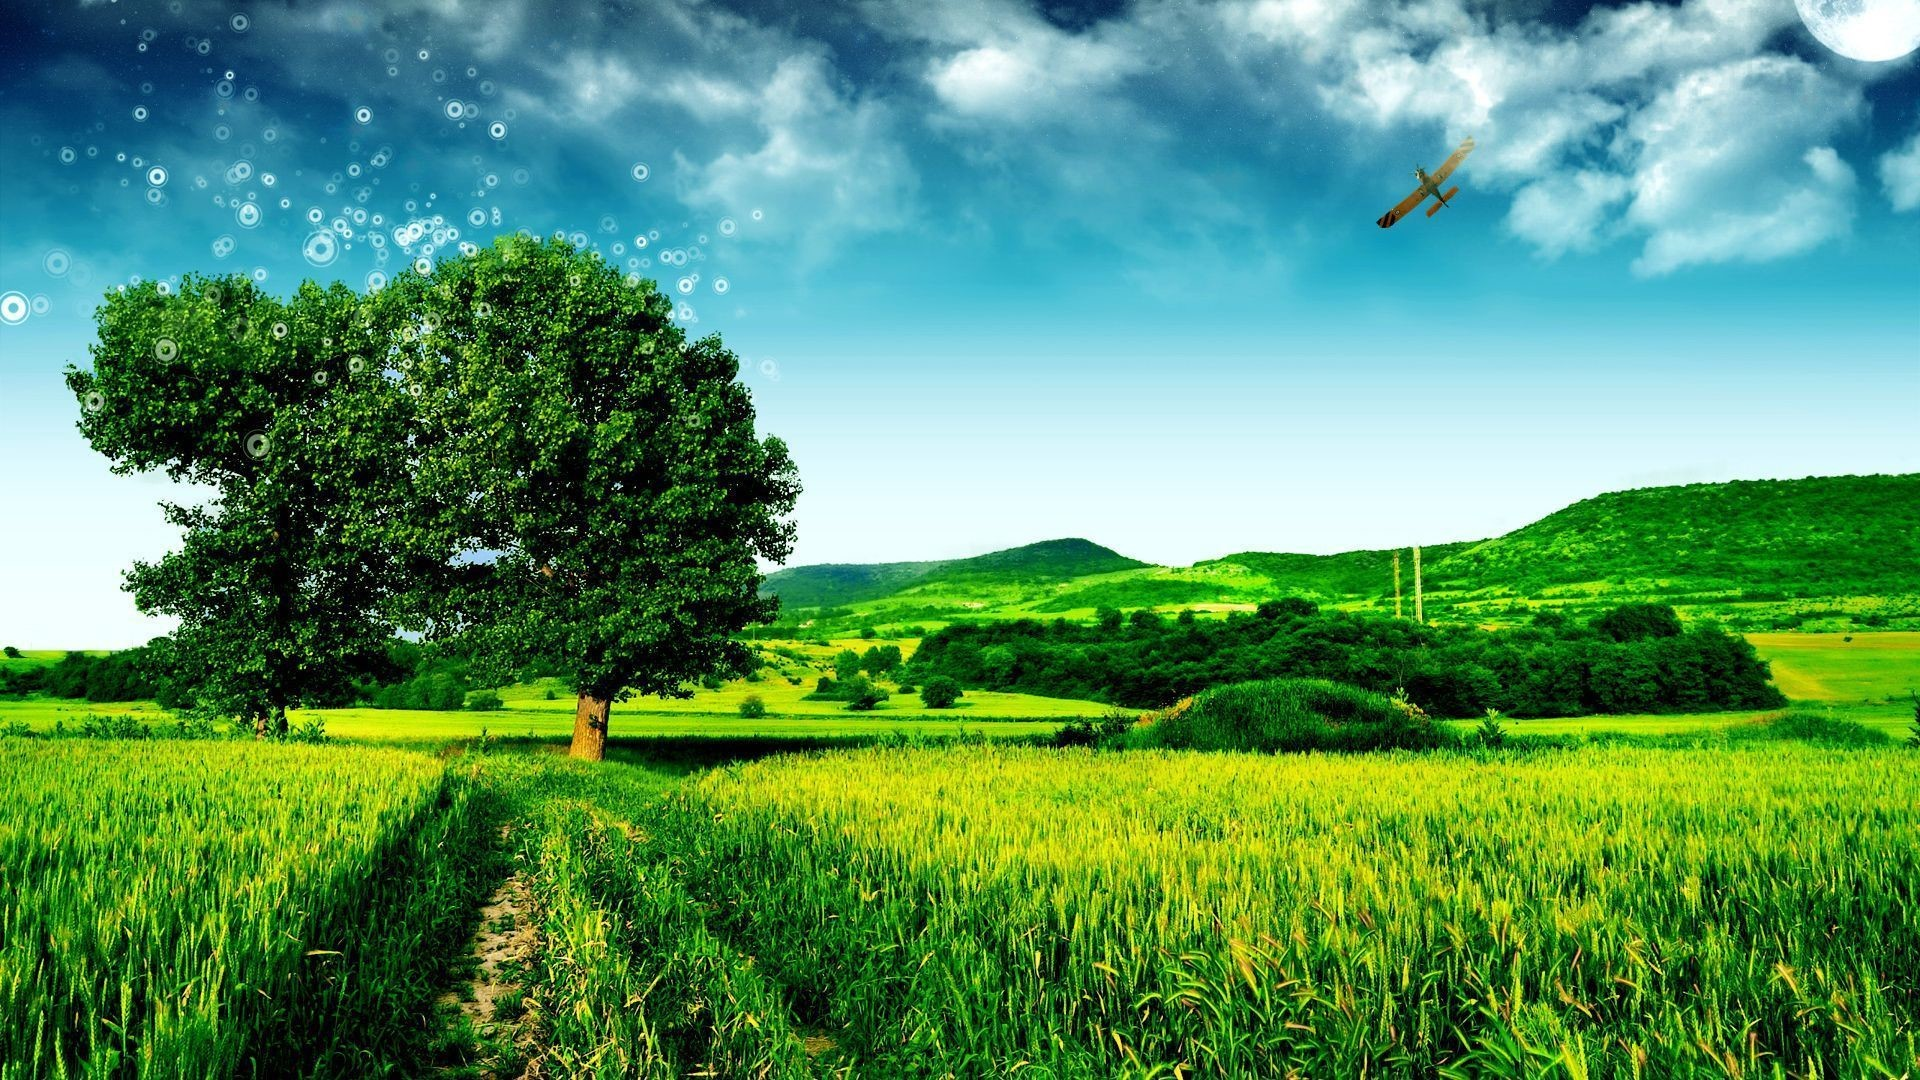 Cool landscape hd wallpapers 1080p On Desktop Backgrounds with landscape hd  wallpapers 1080p Download HD Wallpaper